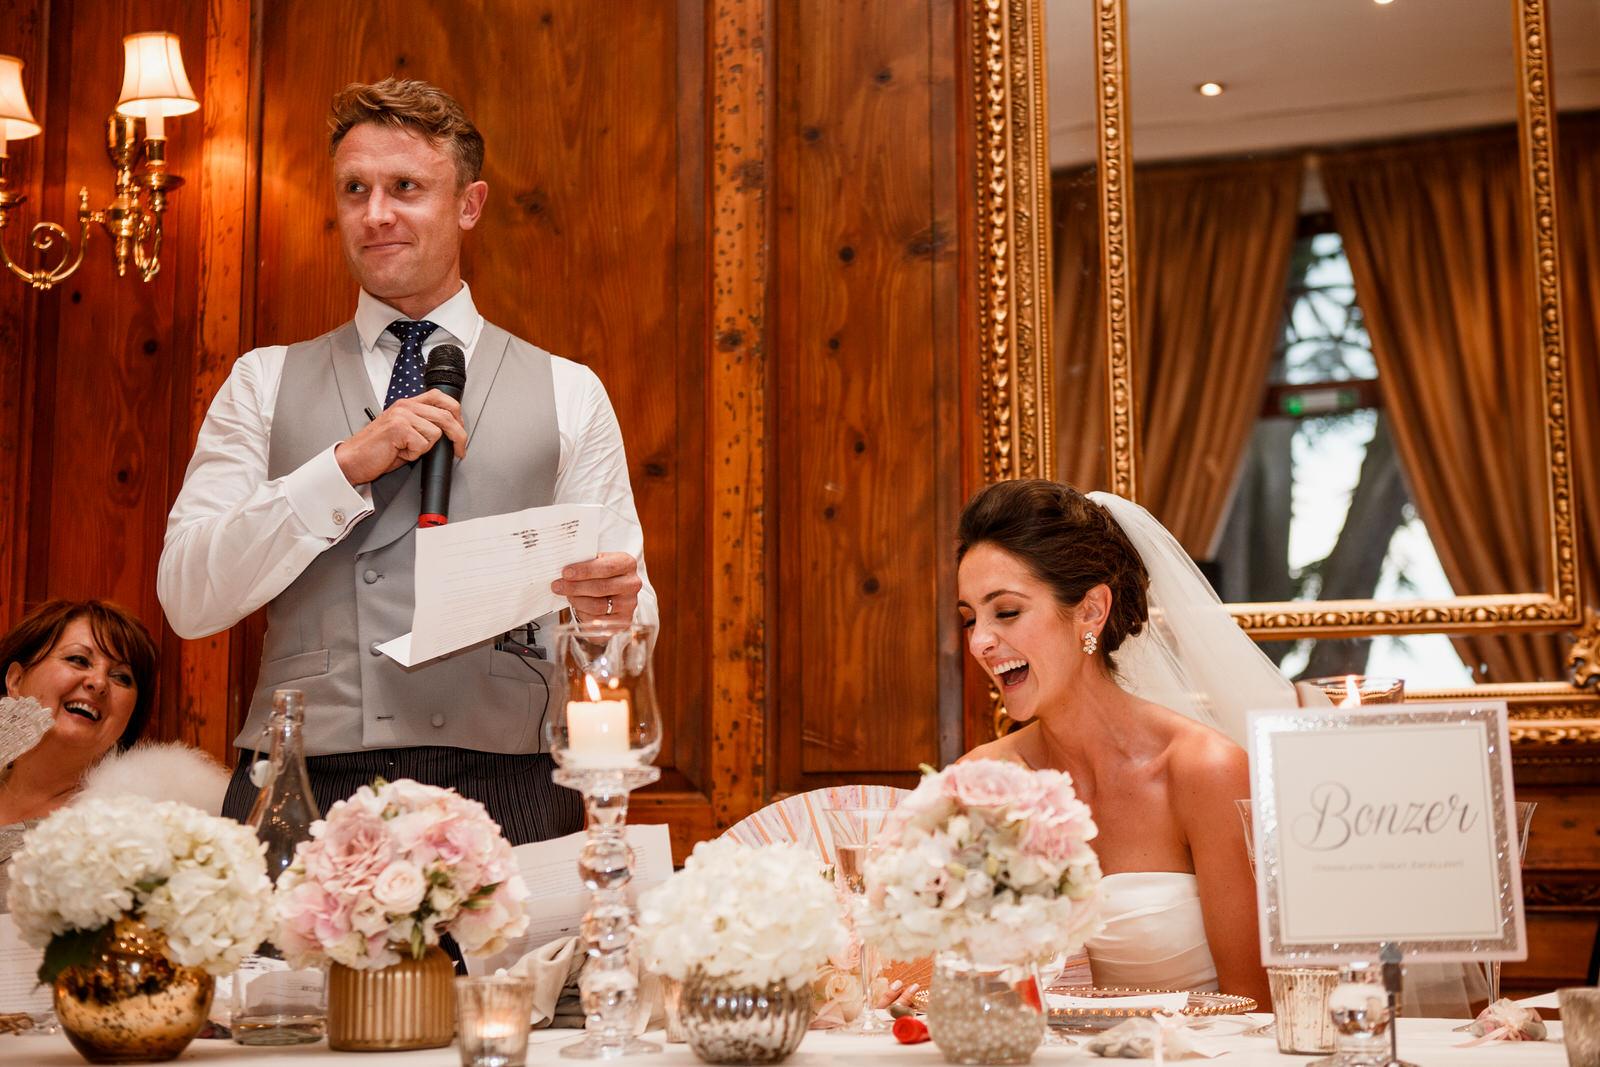 Home counties wedding photography by Damion Mower on English-Wedding.com (21)